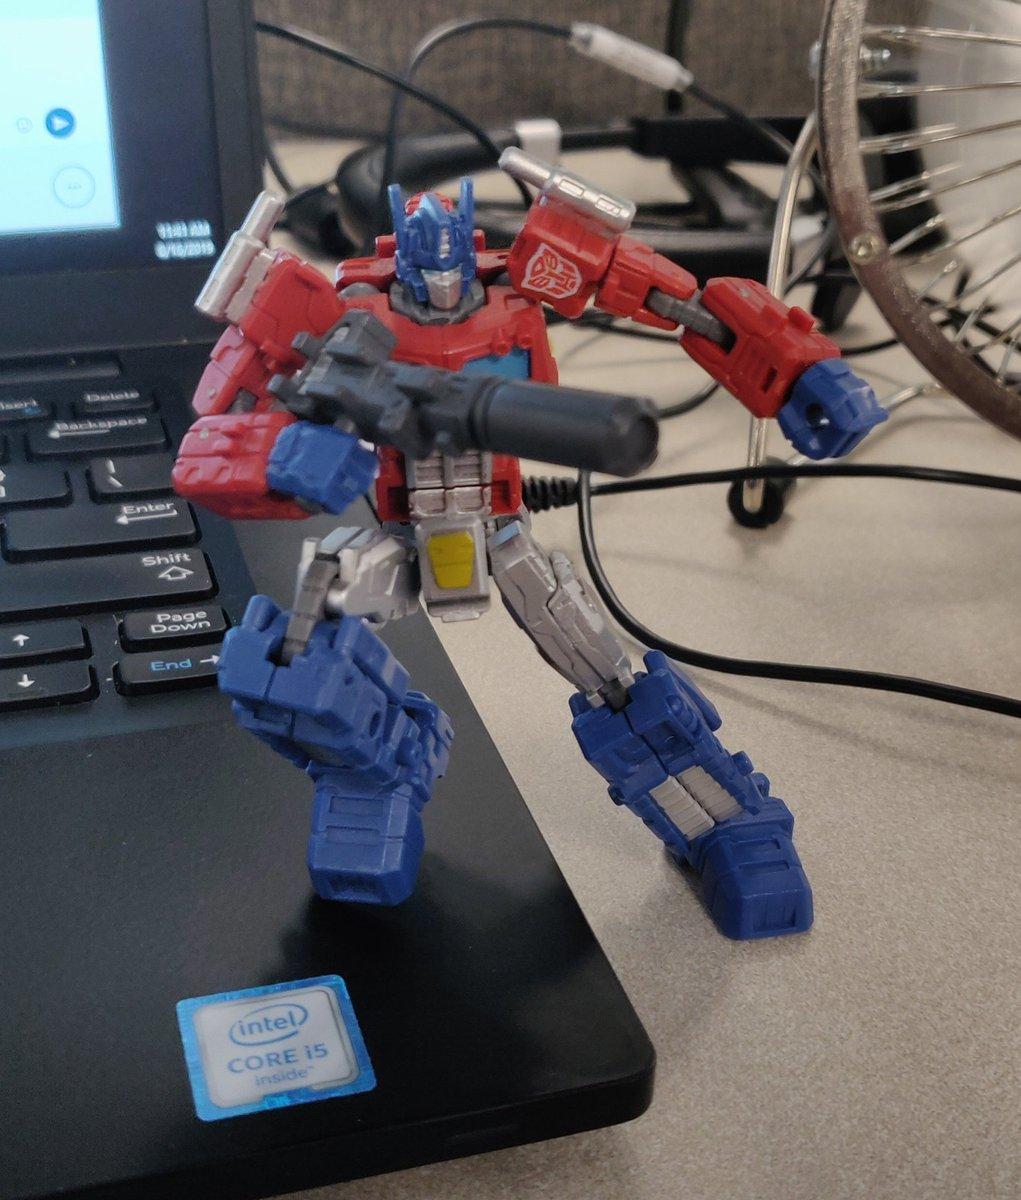 #deskbot